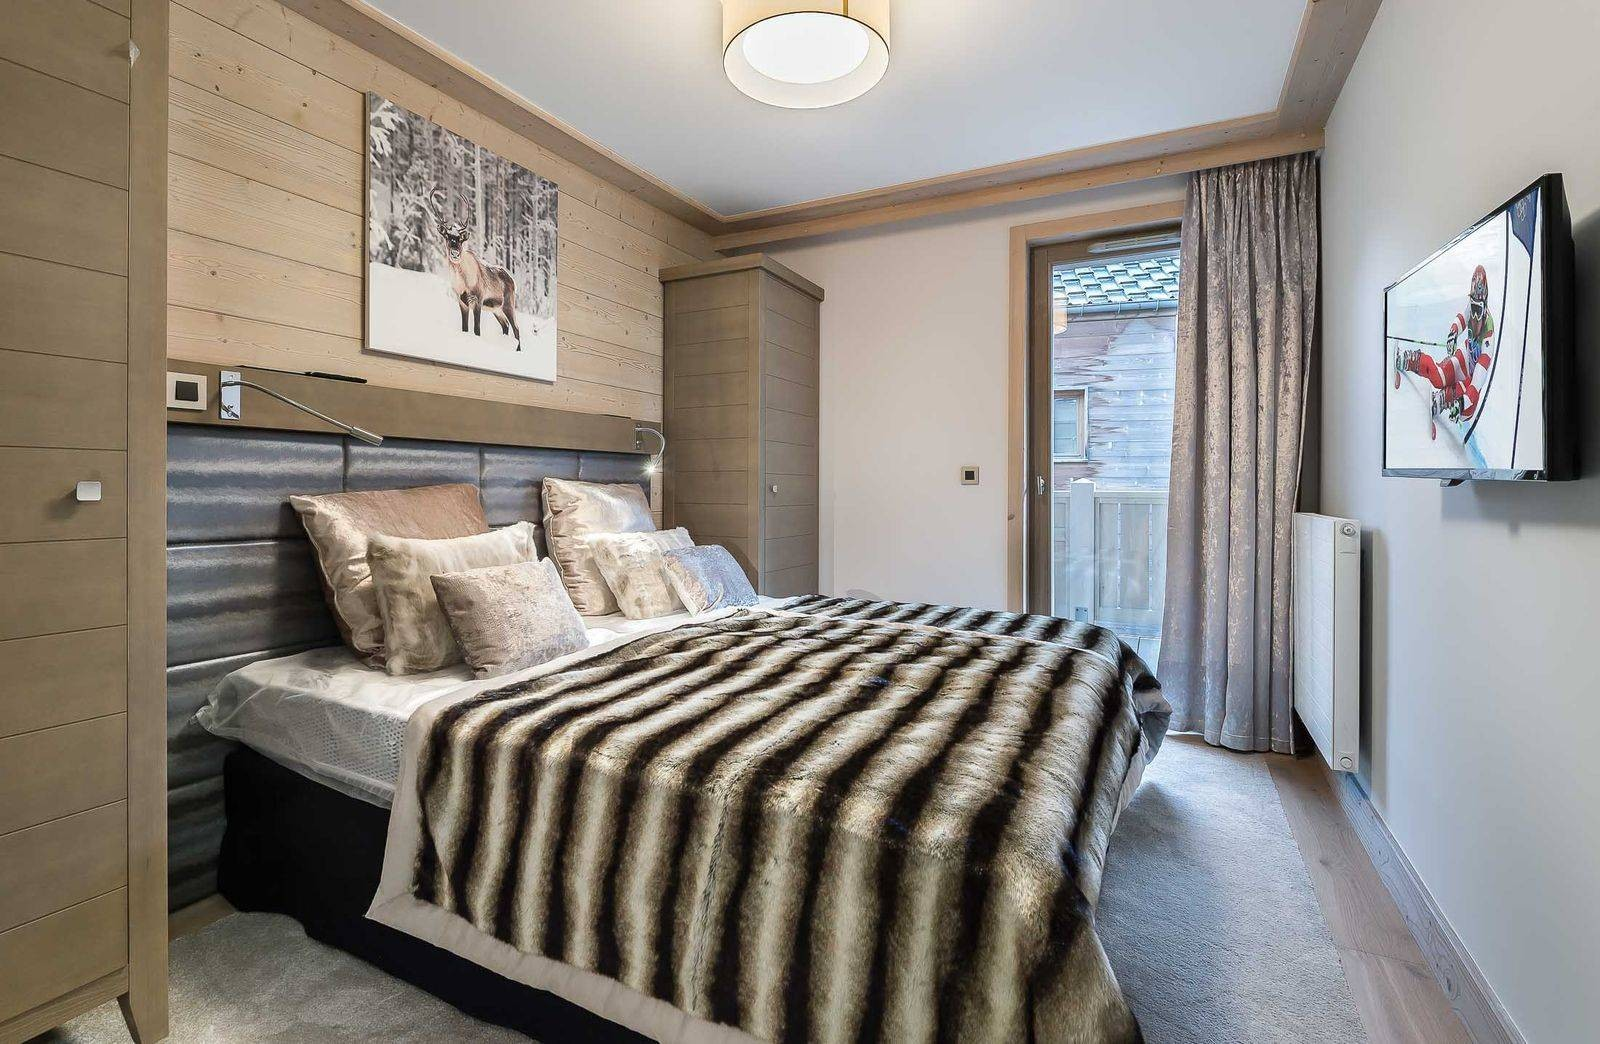 Courchevel 1550 Location Appartement Luxe Telumite Chambre 2